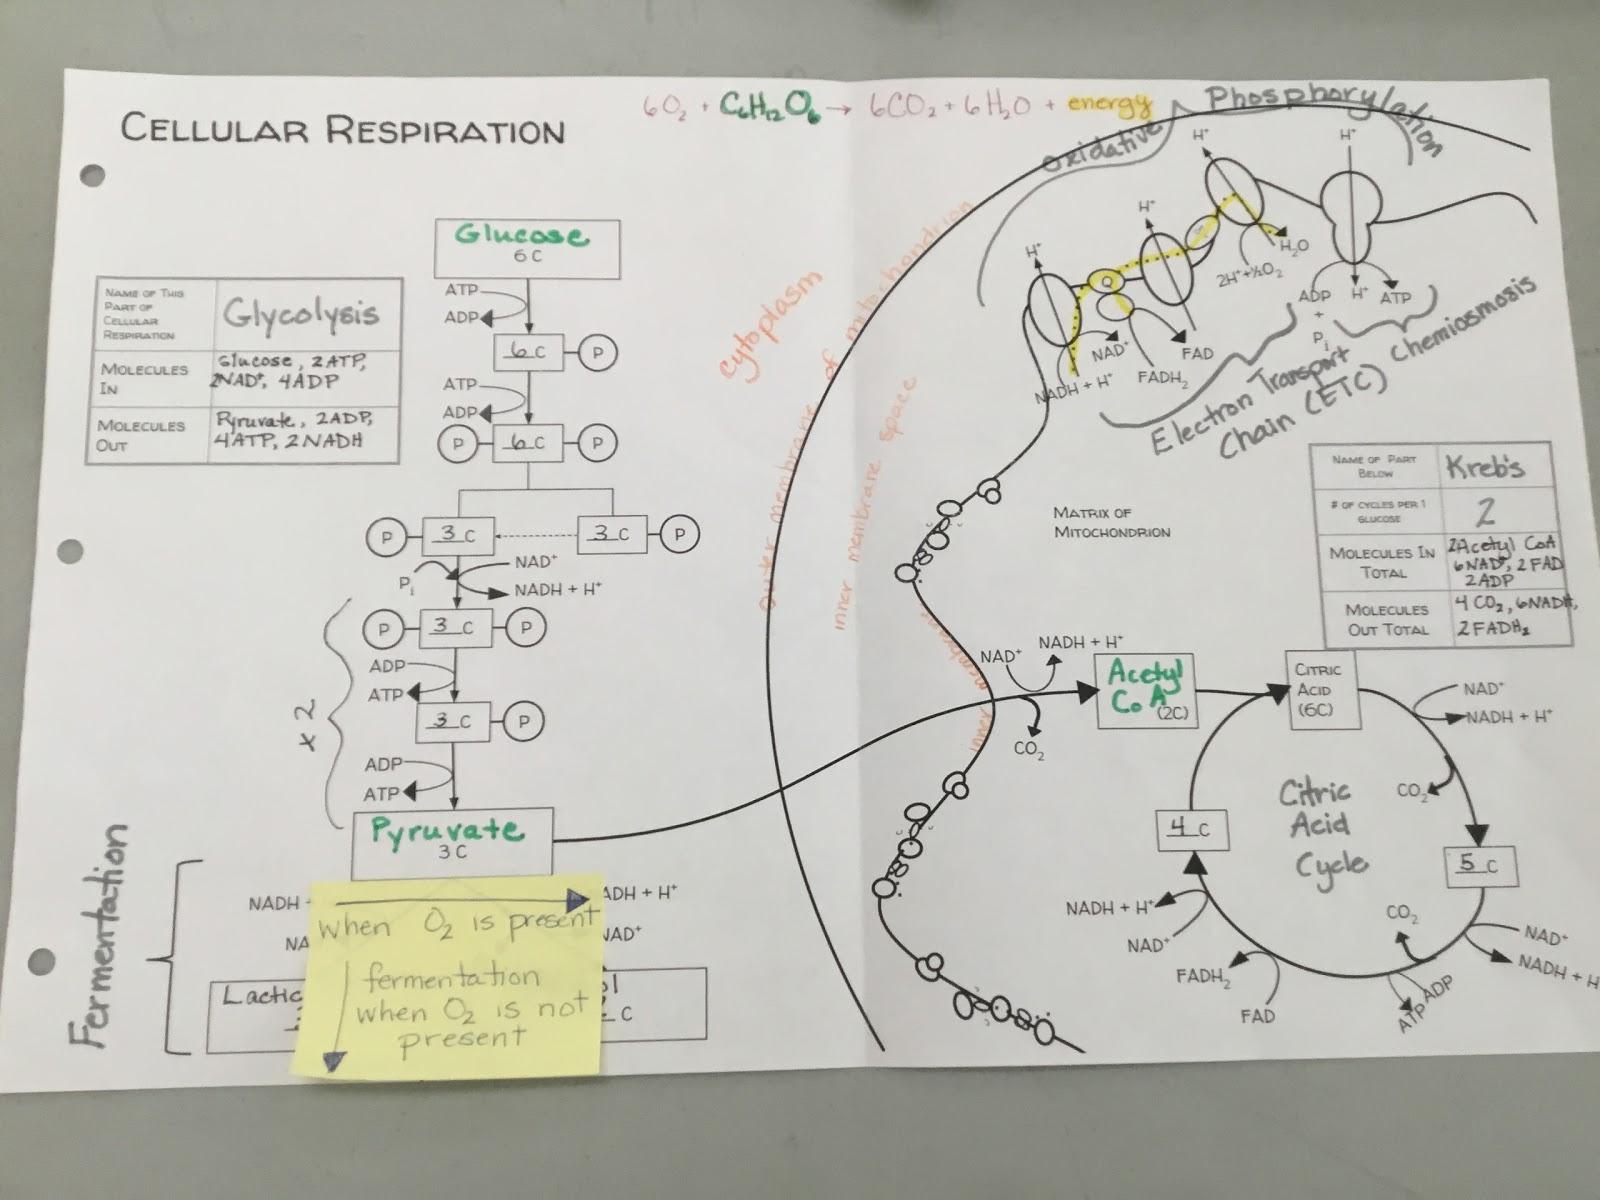 biology by the math mom: cellular respiration digital diagram